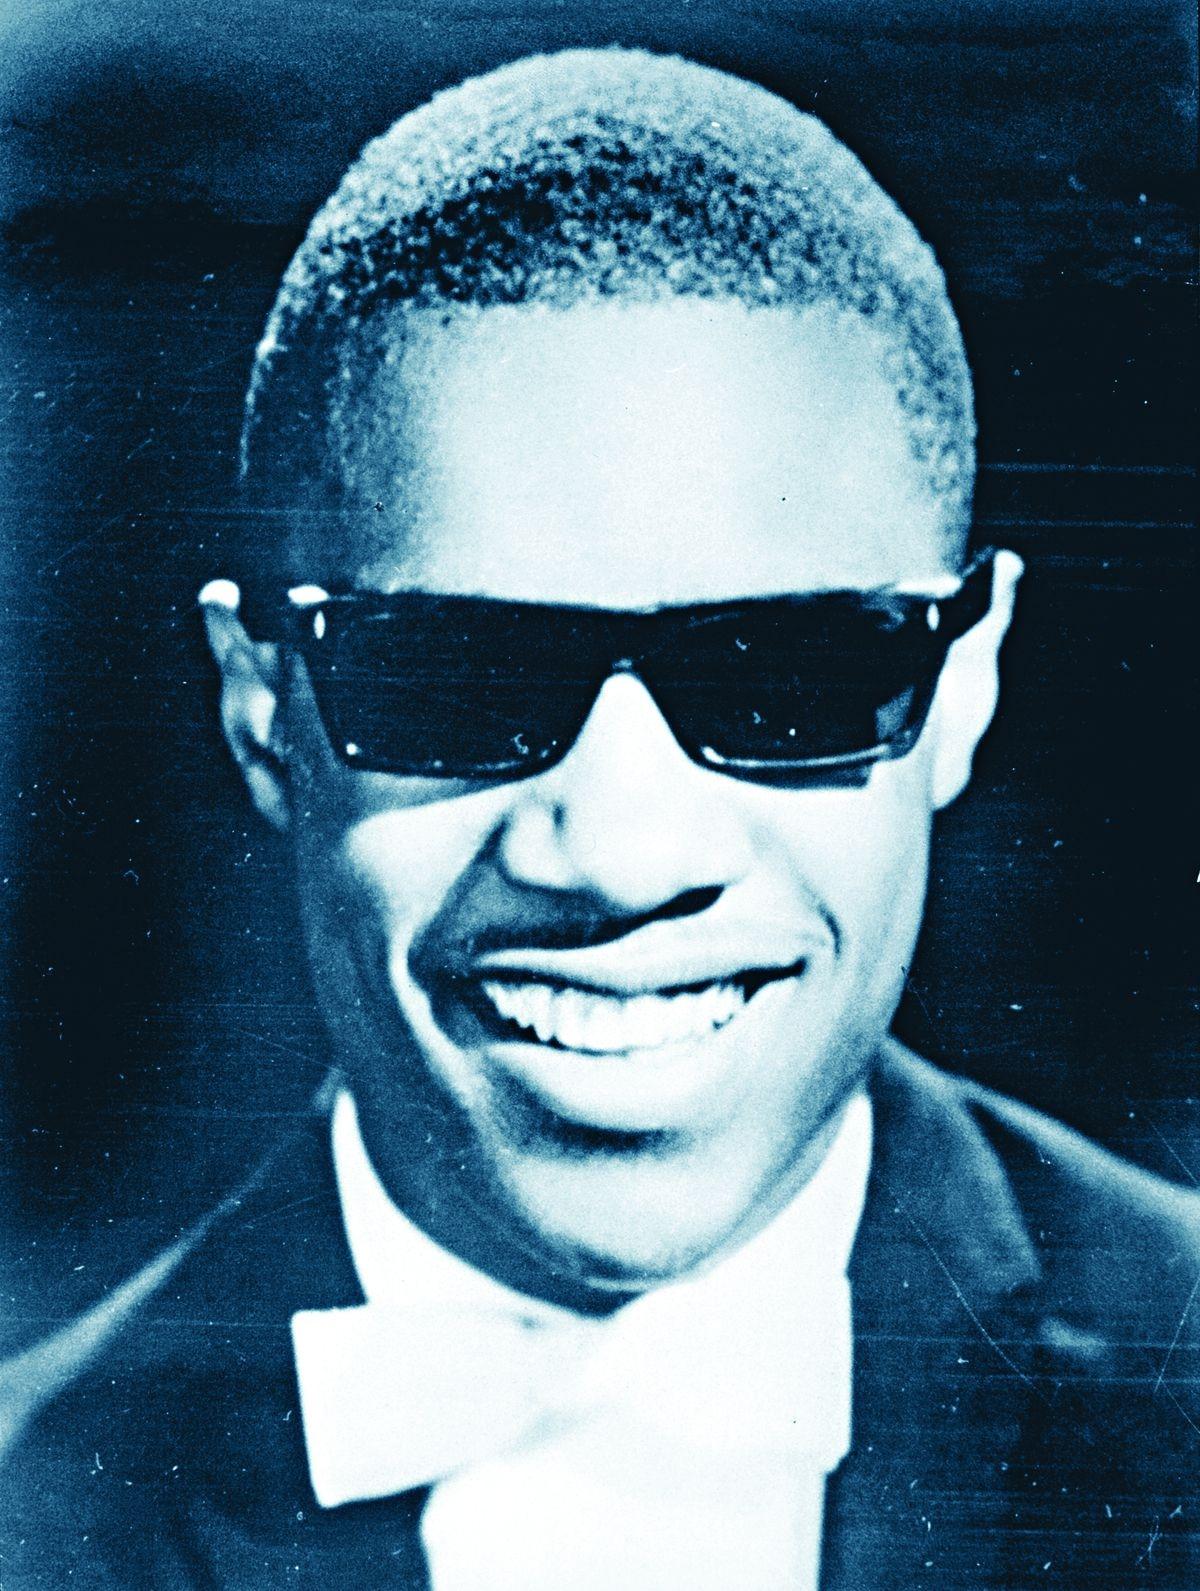 Stevie Wonder performed on the club's stage